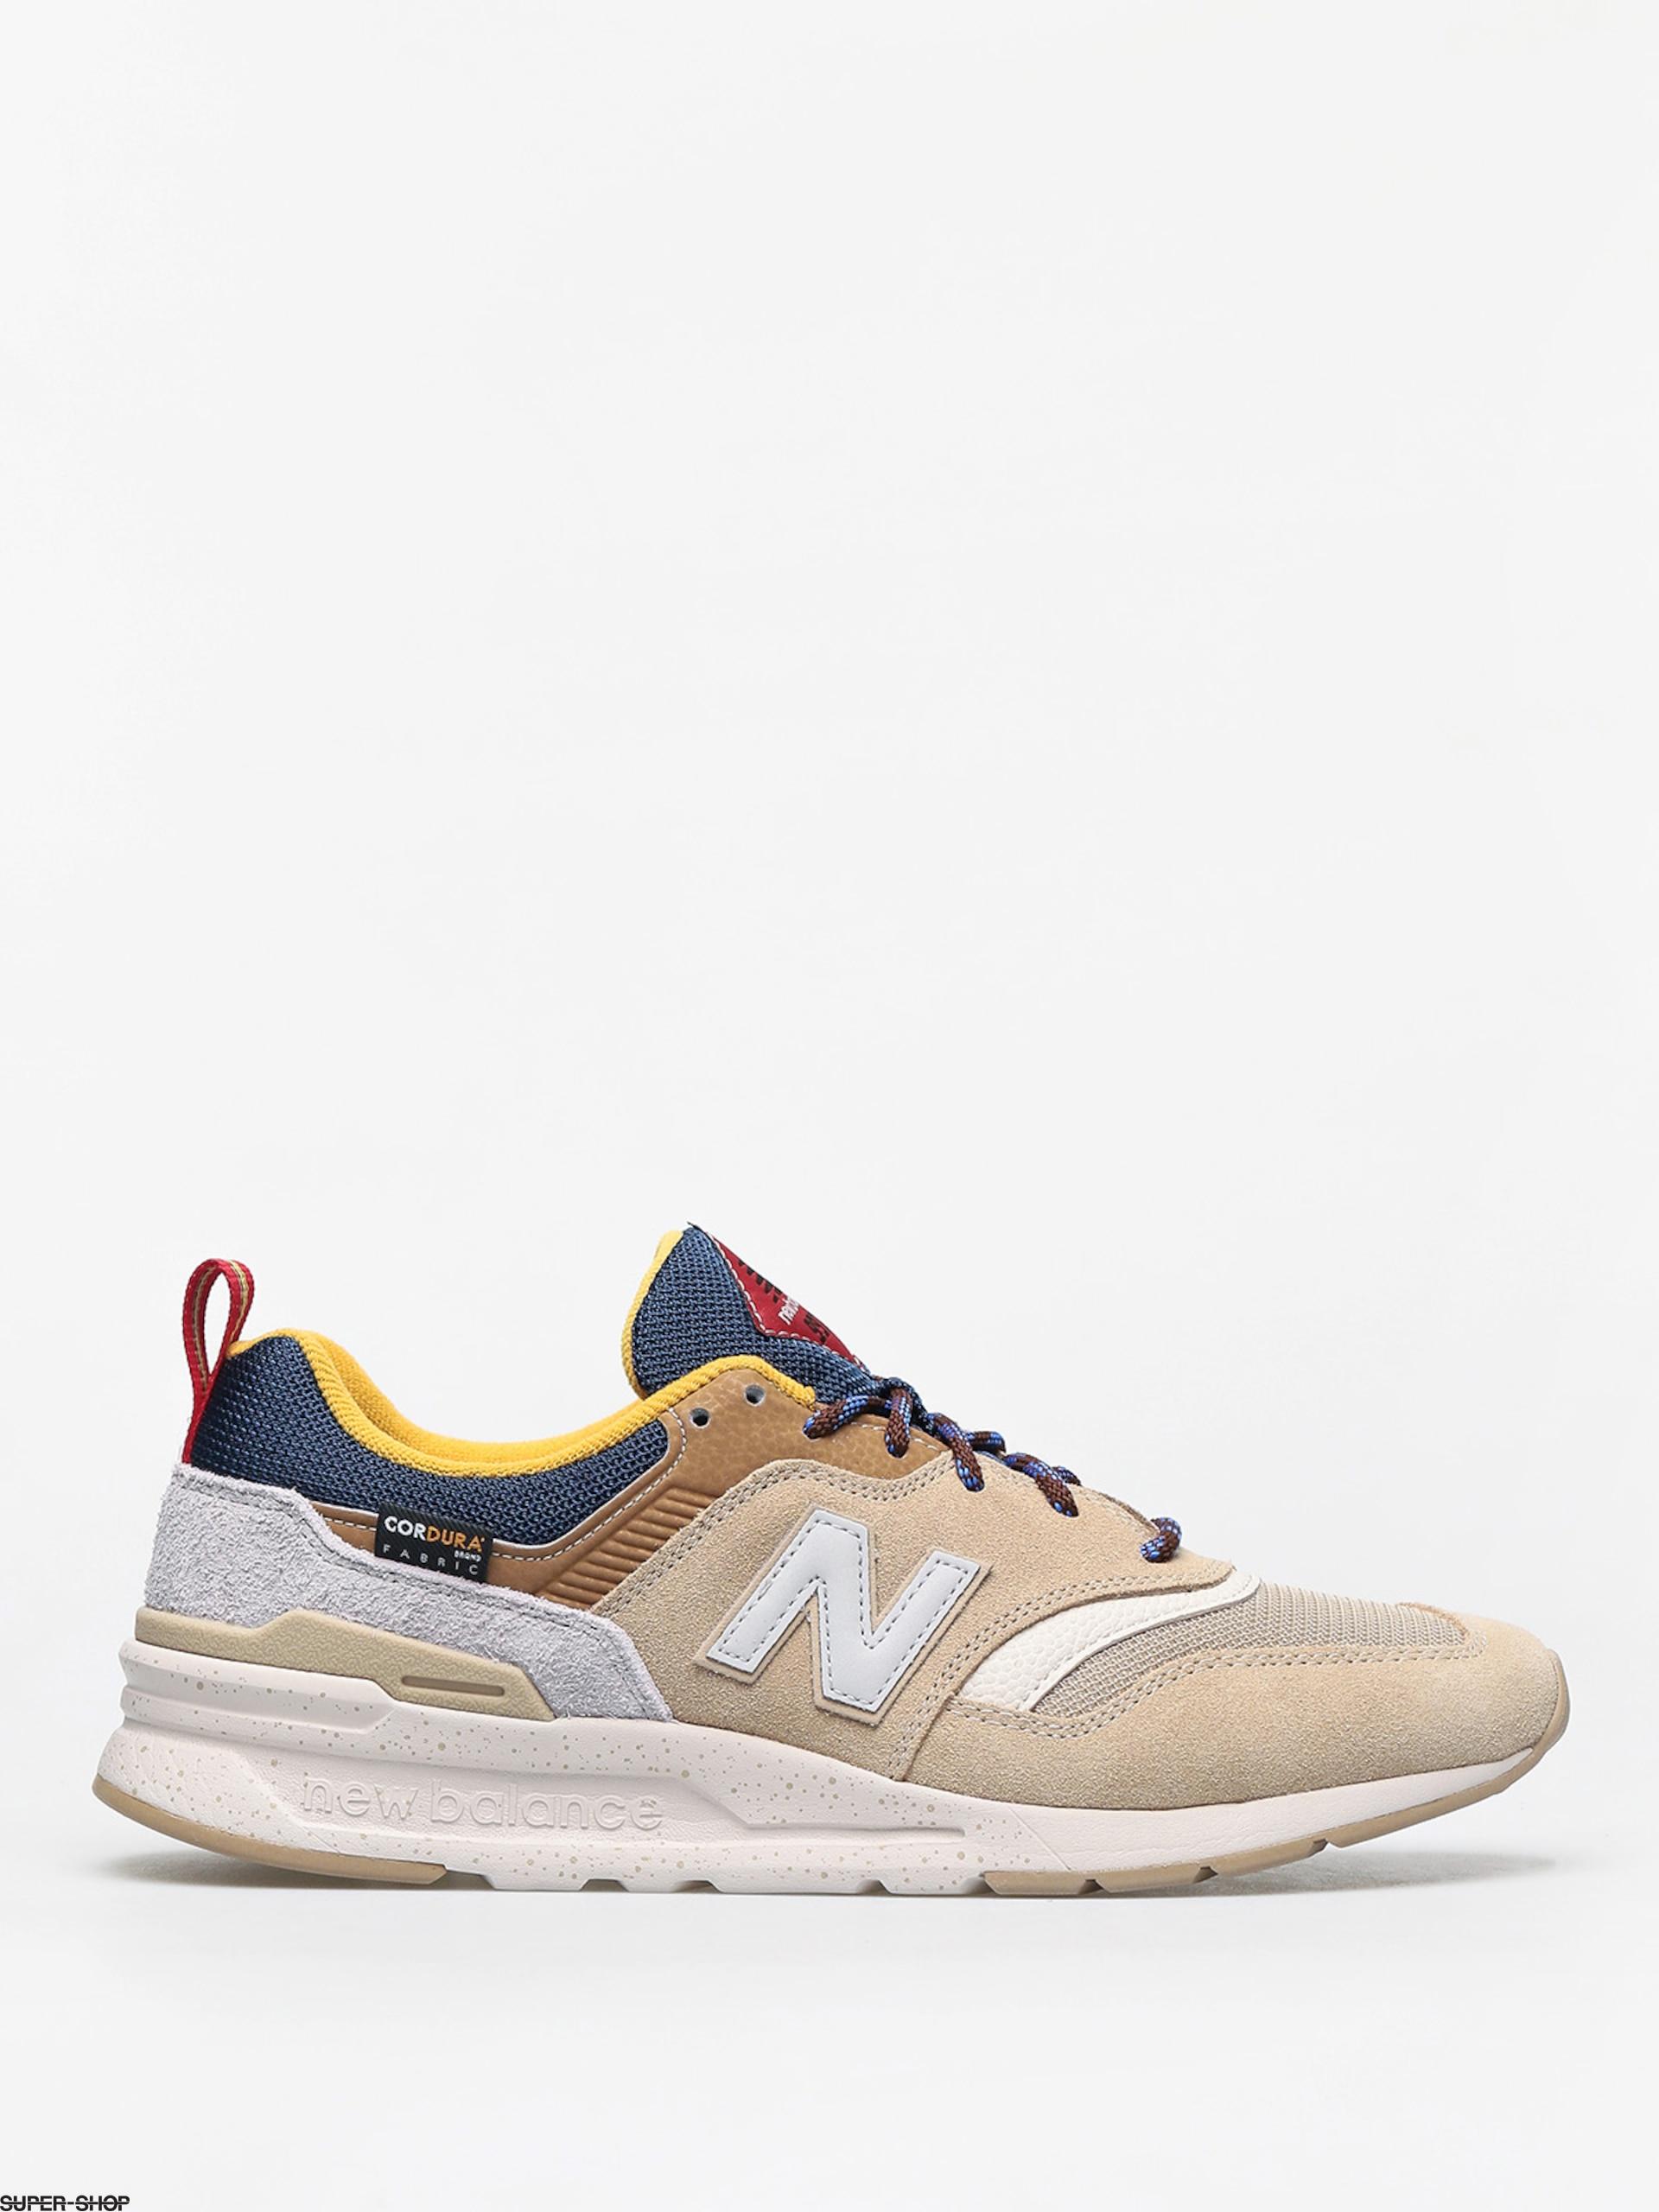 best service 65a98 35d88 New Balance 997 Shoes (tan)